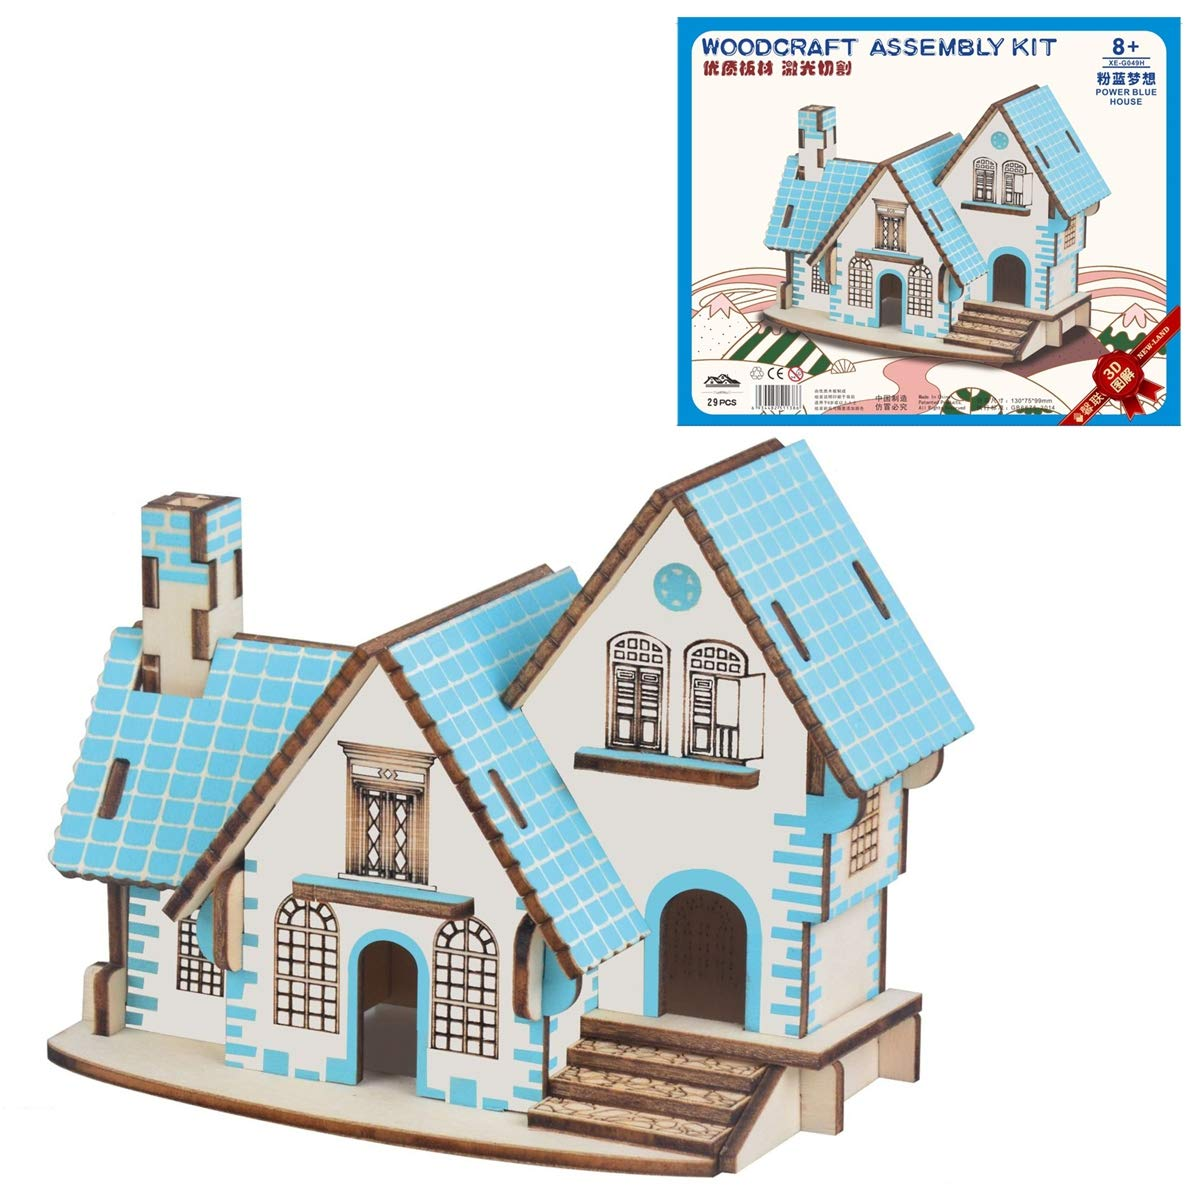 LSQR DIY Holz 3D Jigsaw Handmade Handmade Handmade Puzzle Toys, Colorful Power Blue House Dreidimensionales Simulation Bildungsmodell, Kinder Geburtstag c25cca